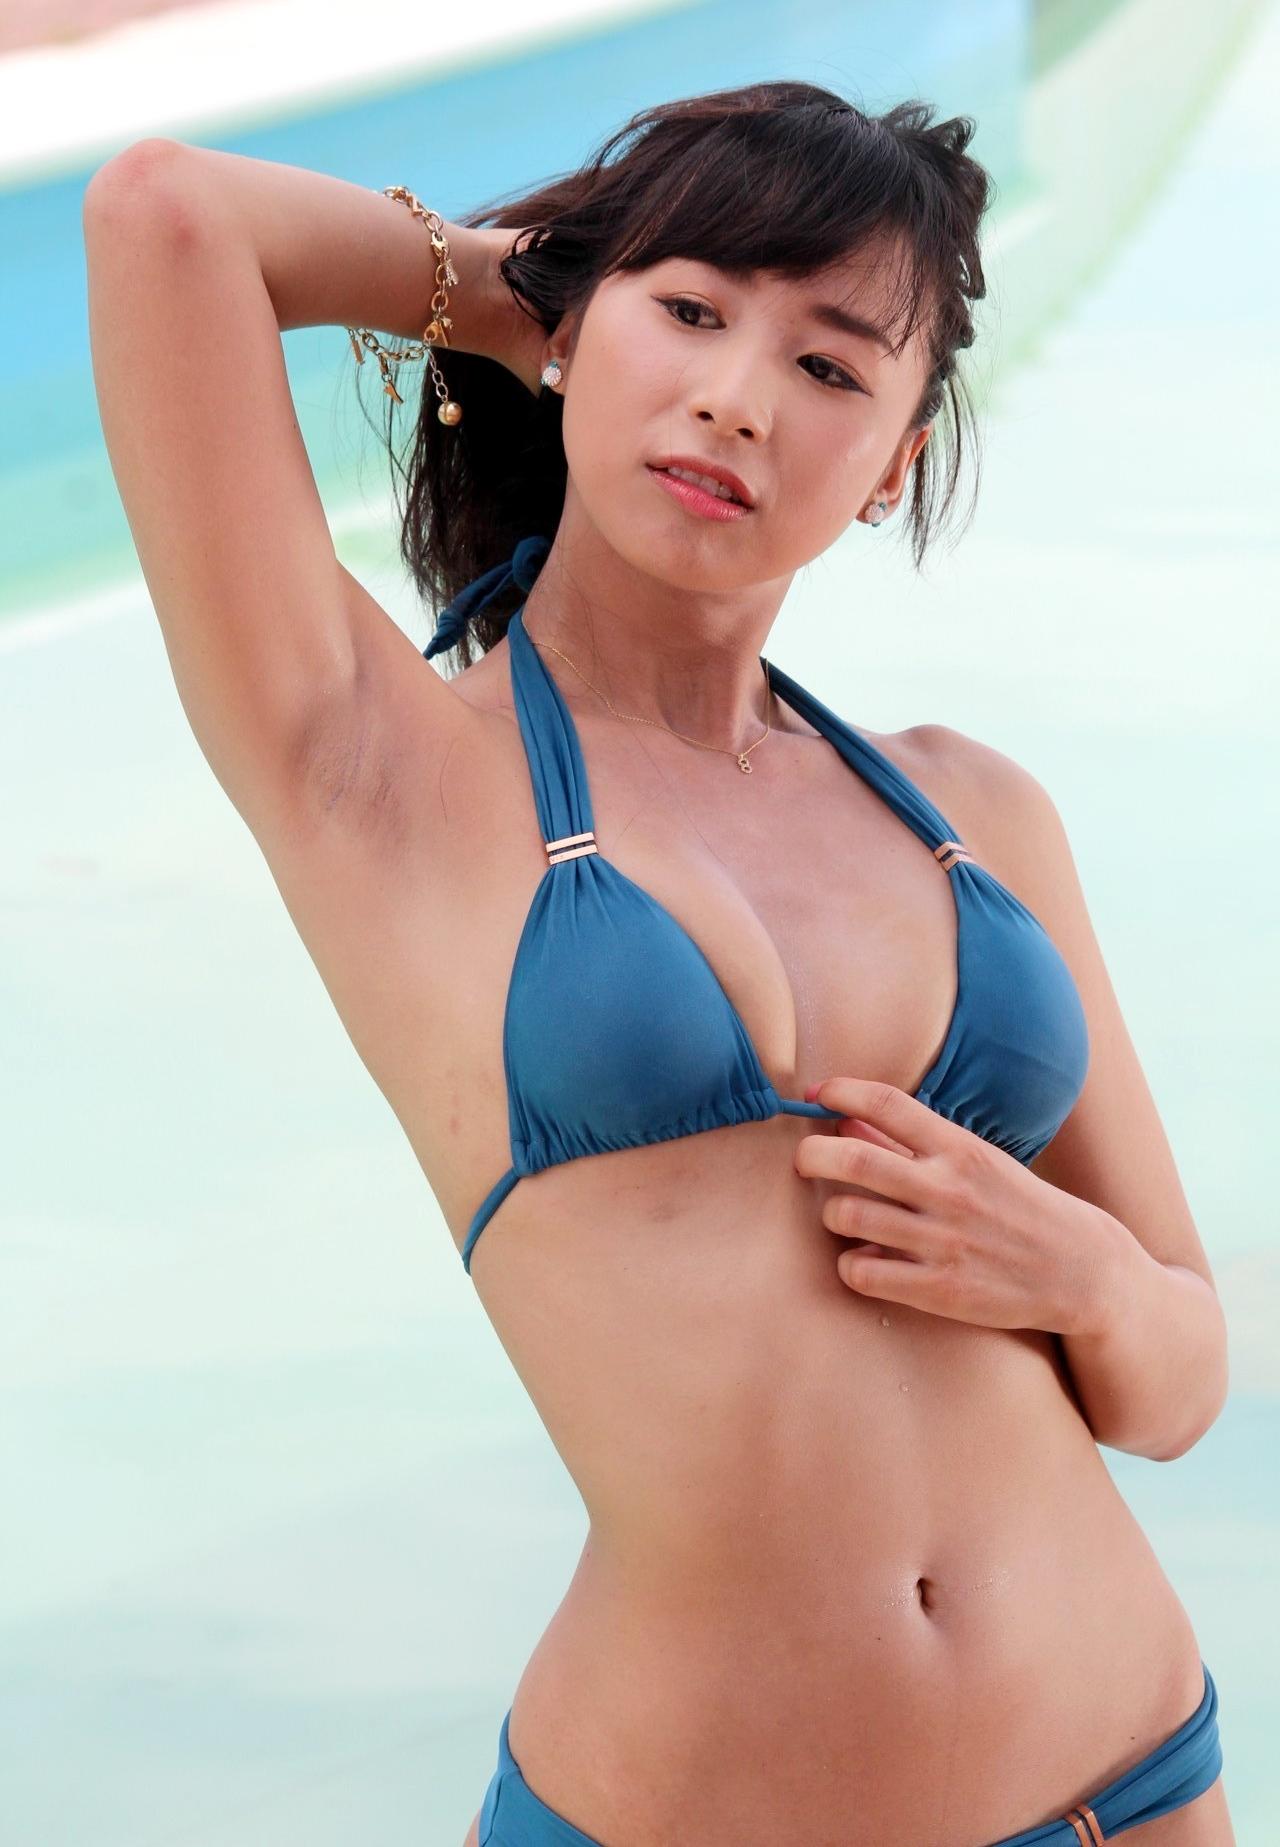 Azullyのザラ腋 (2)